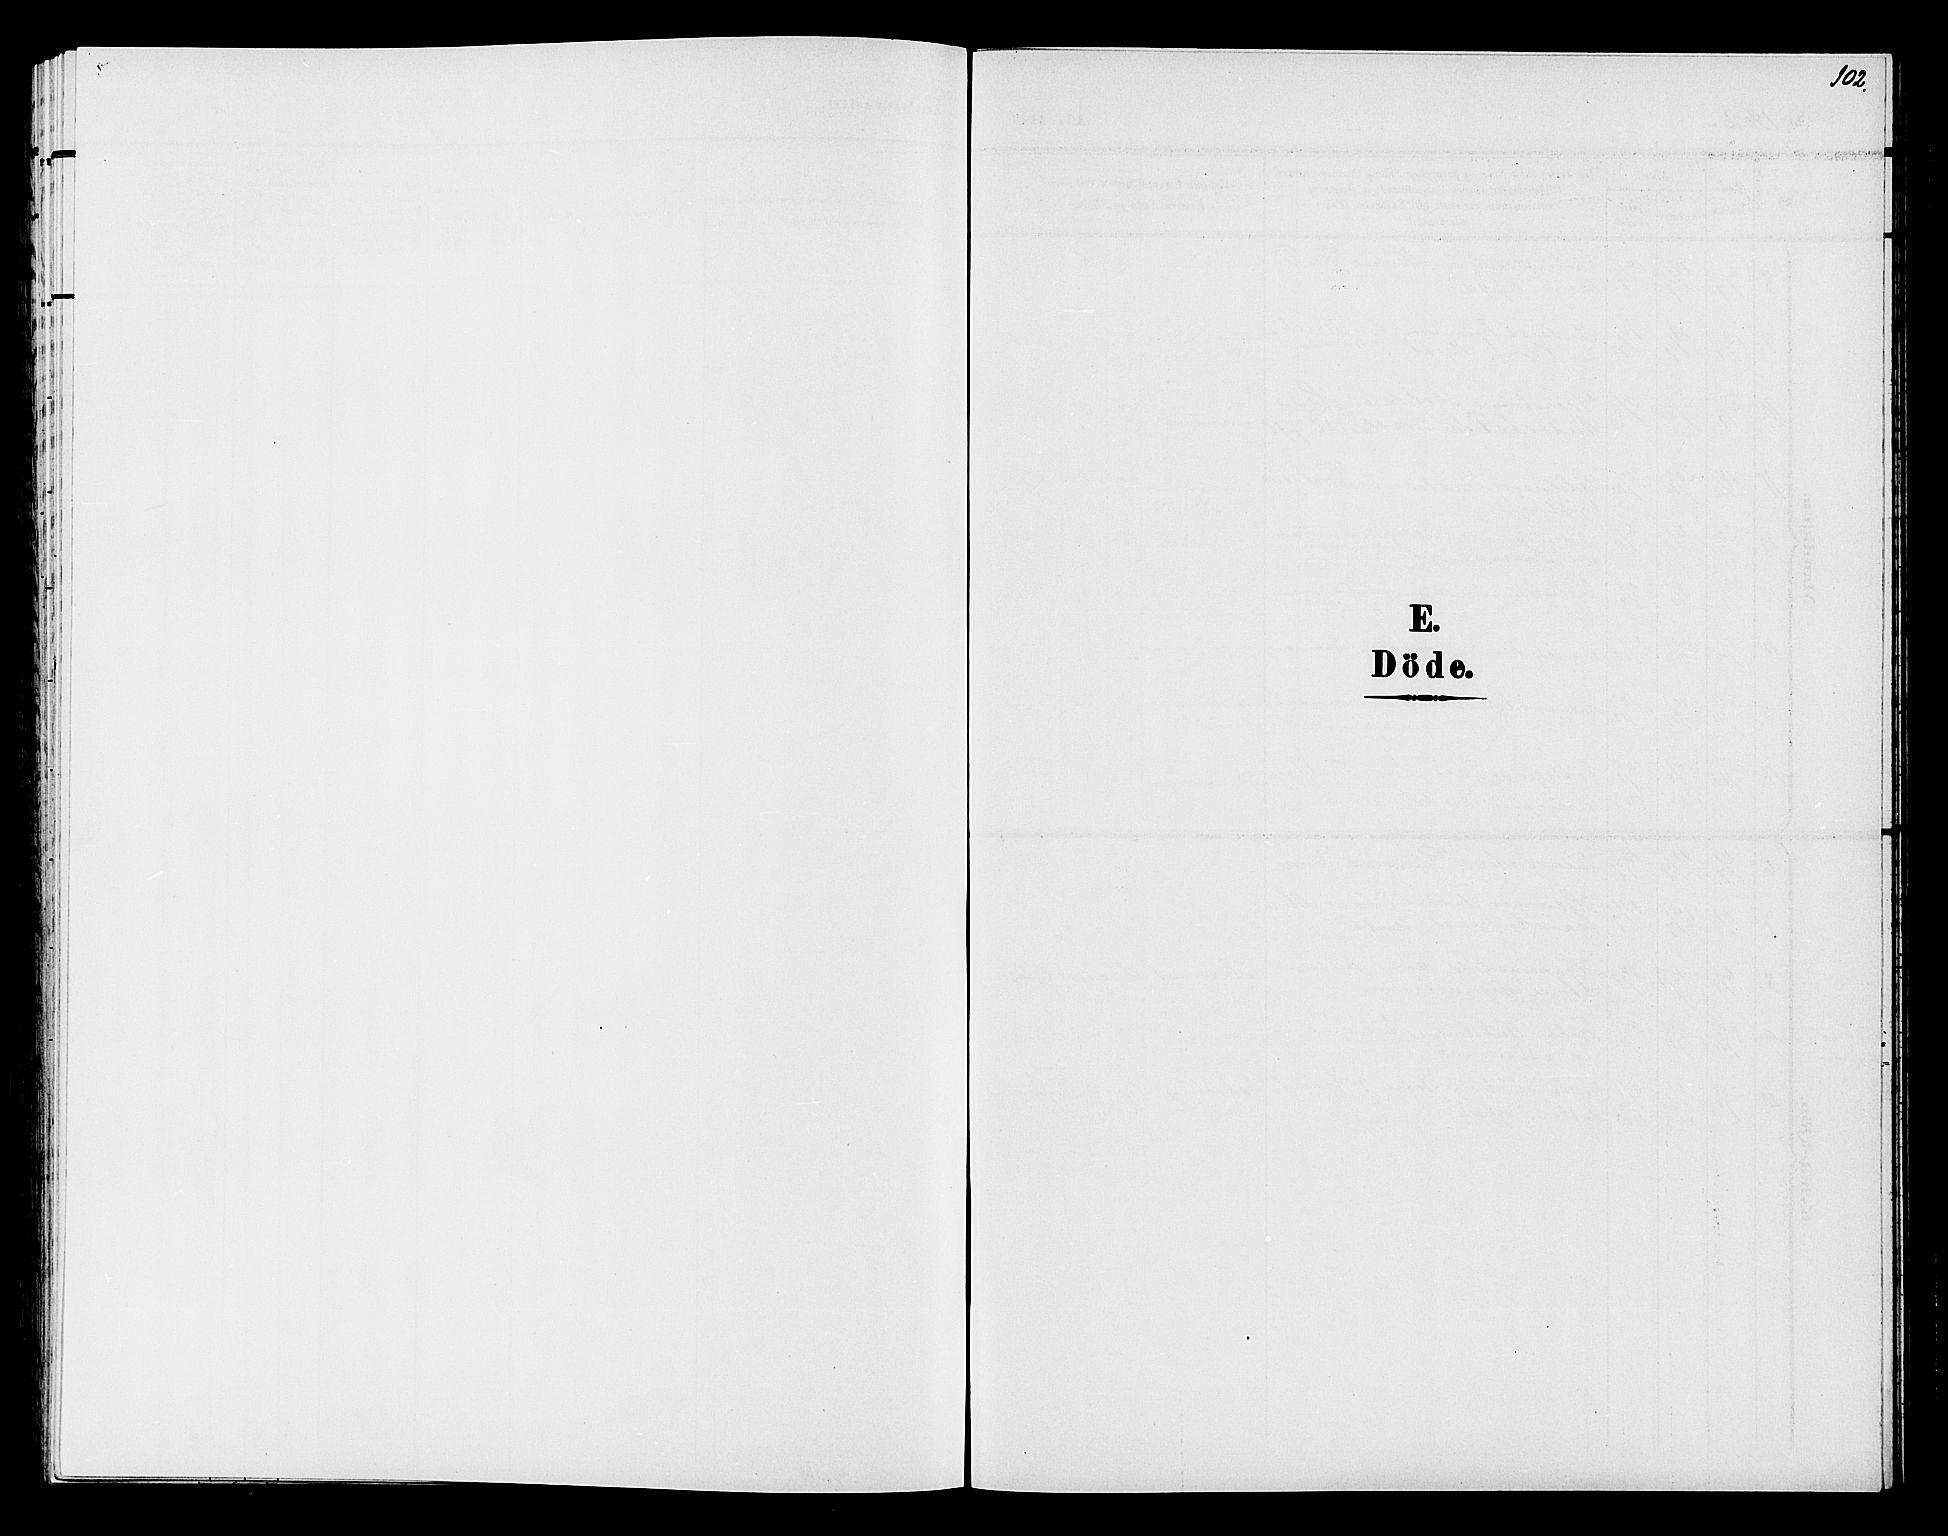 SAH, Søndre Land prestekontor, L/L0005: Klokkerbok nr. 5, 1902-1911, s. 102